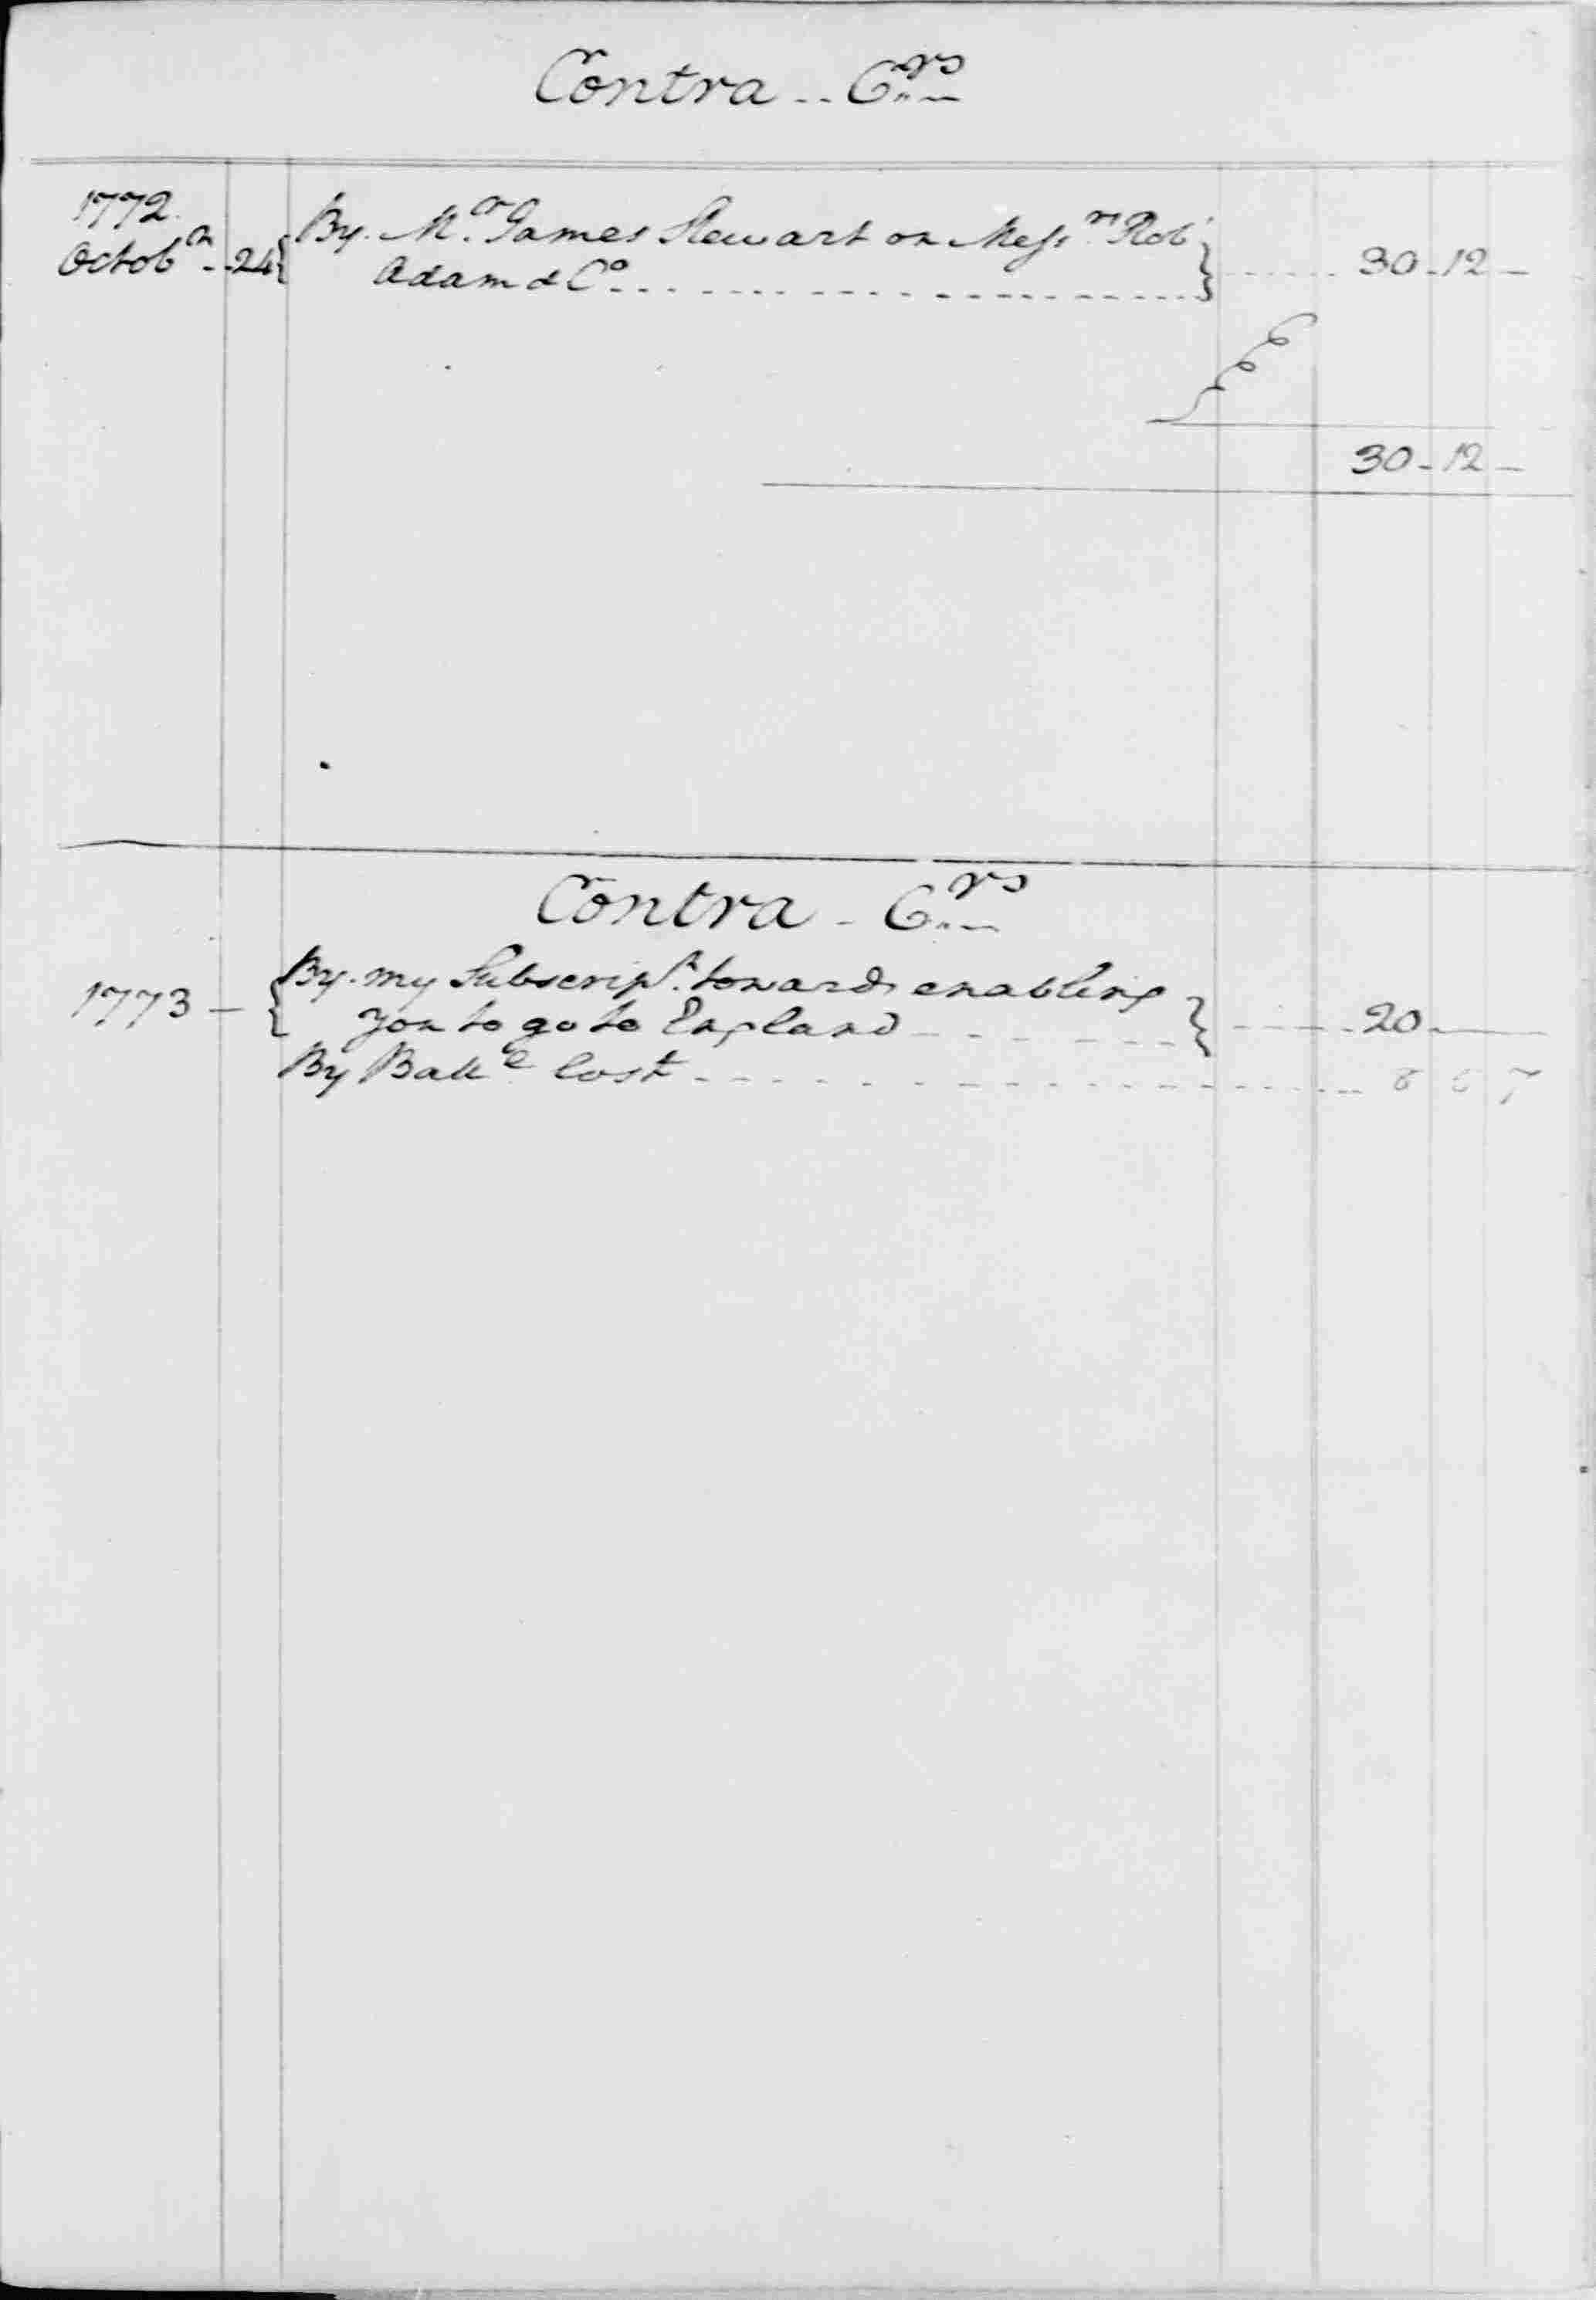 Ledger B, folio 7, right side